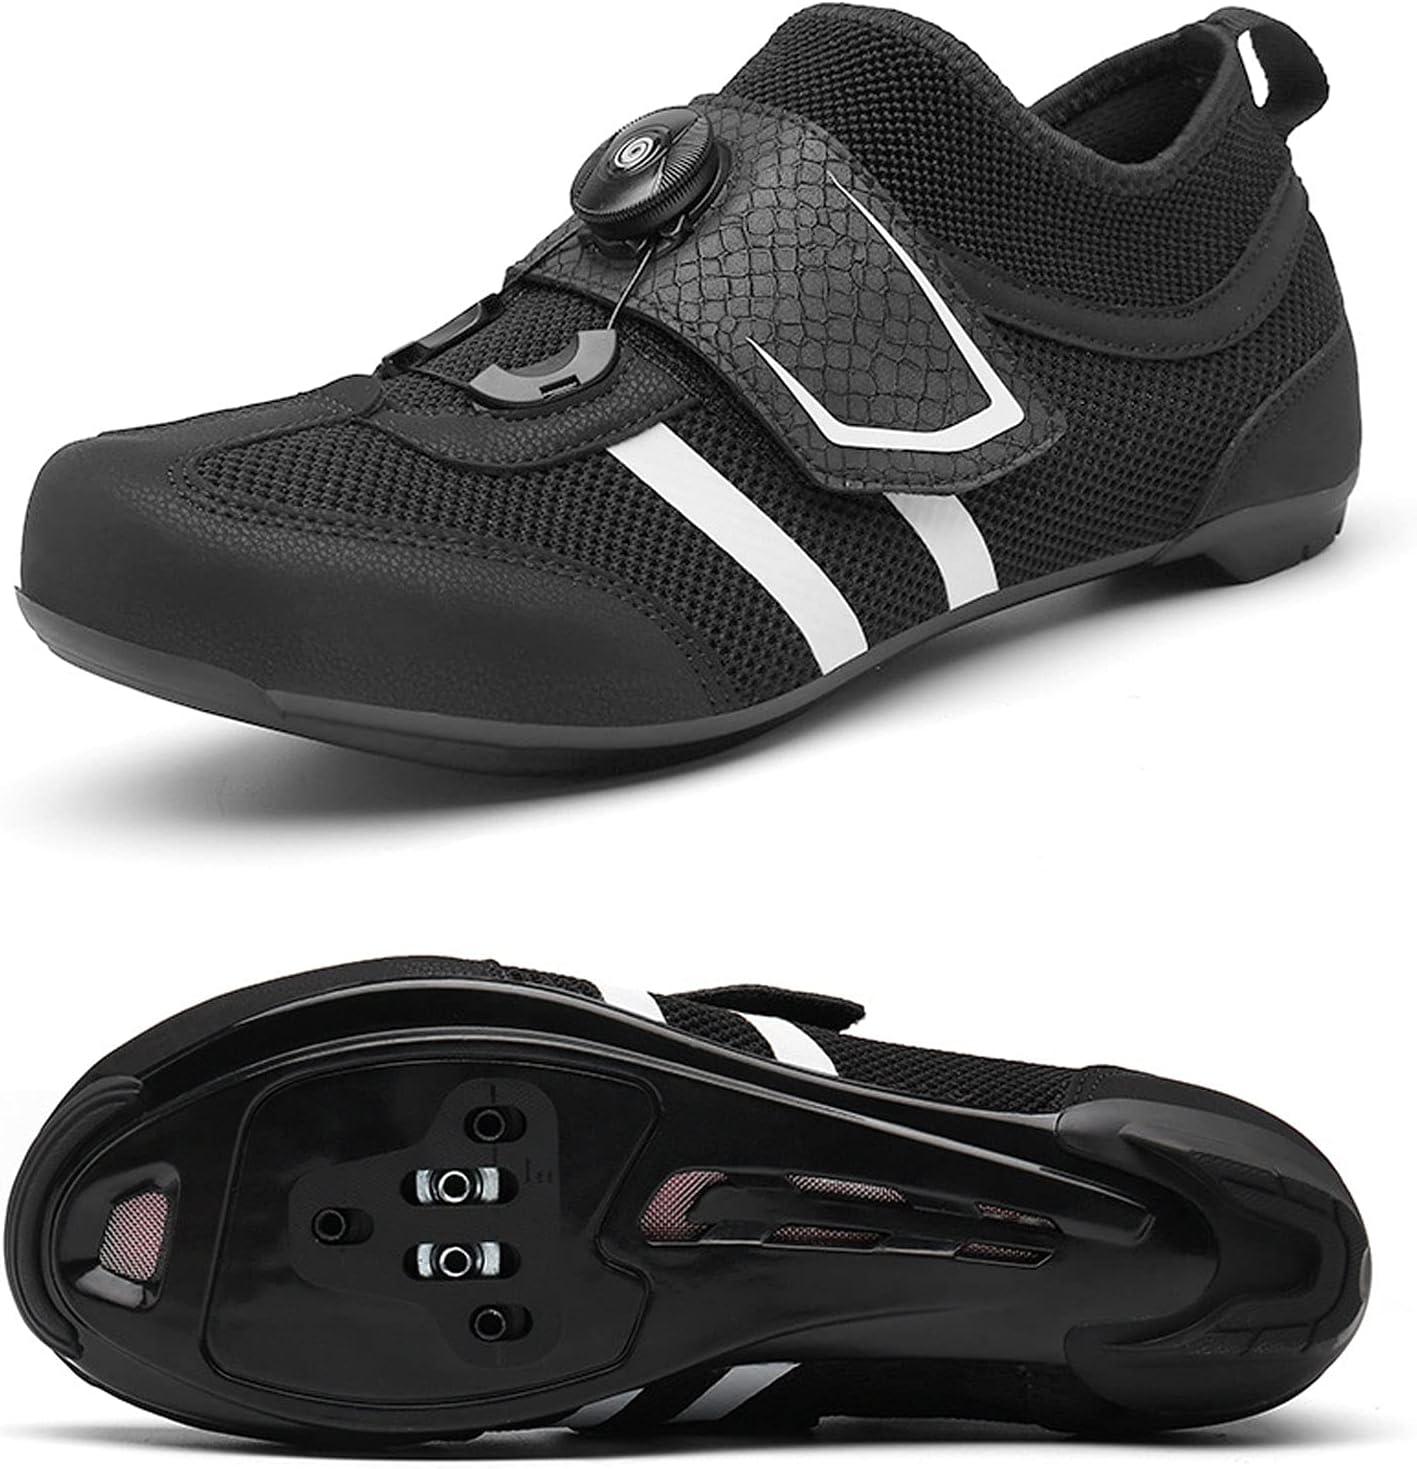 Max 74% OFF DSMGLSBB Mens Cycling Shoes Footwear Non-Slip Indianapolis Mall 39-44 Self-Lockin